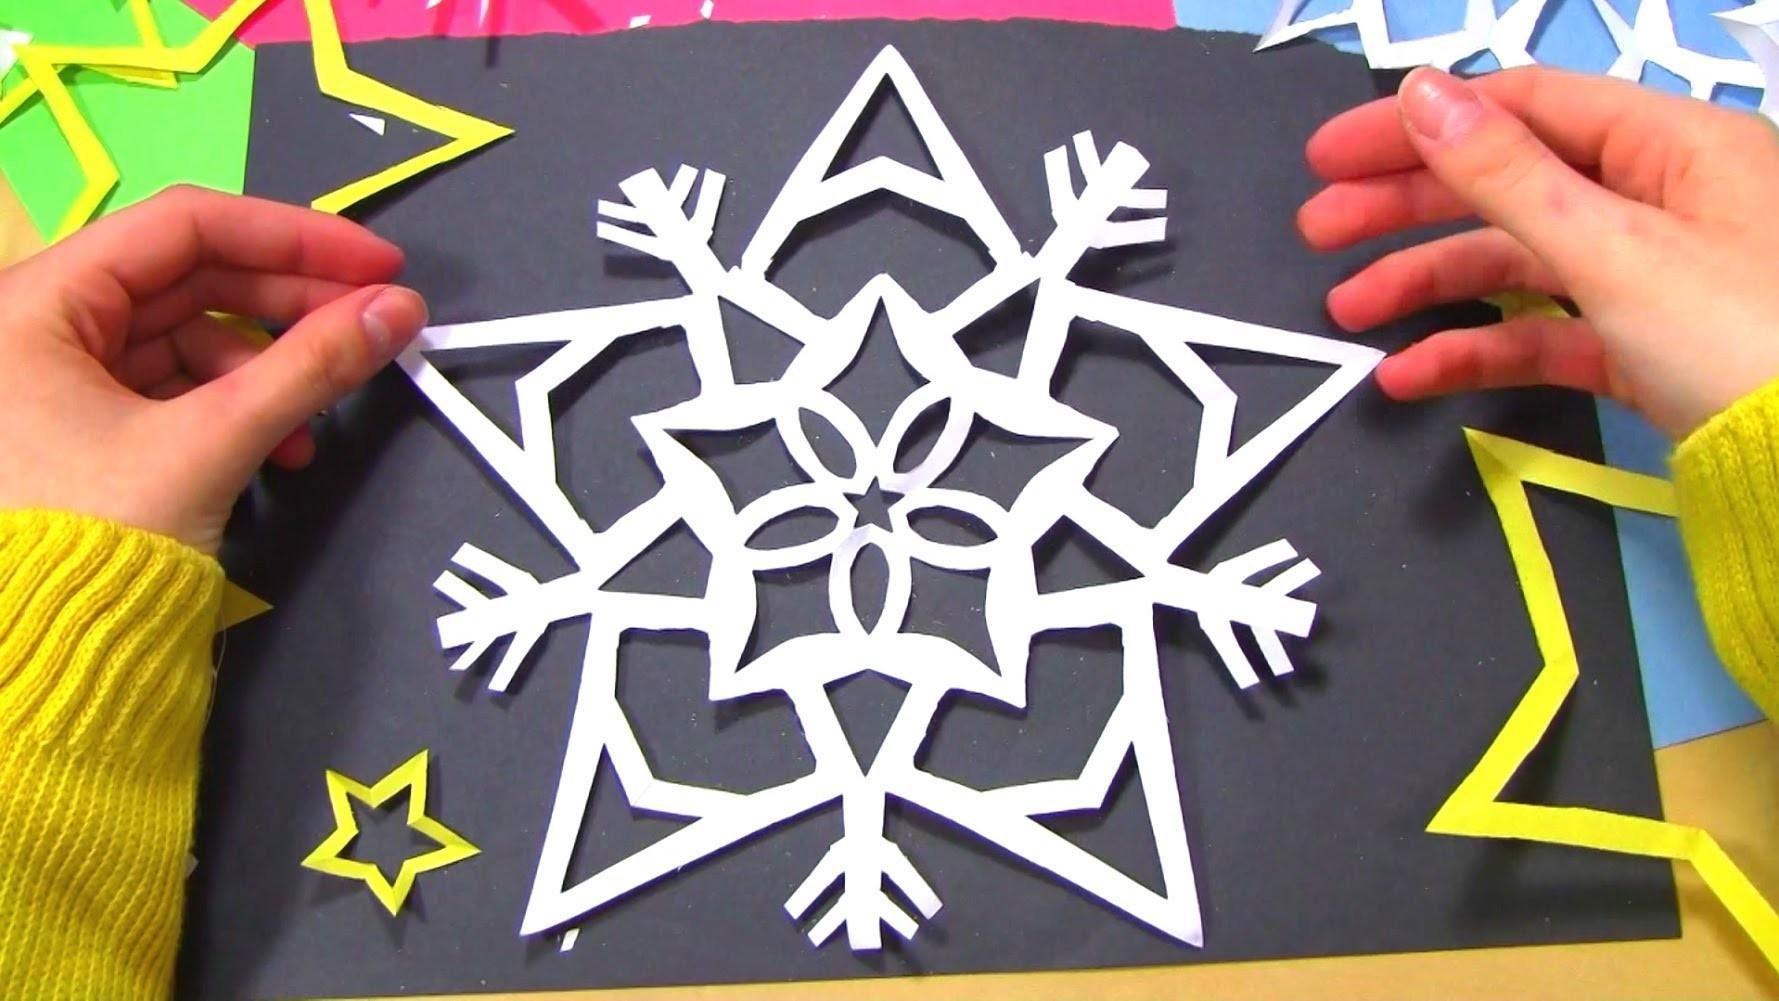 Snowflakes, Starflakes, and Swirlflakes